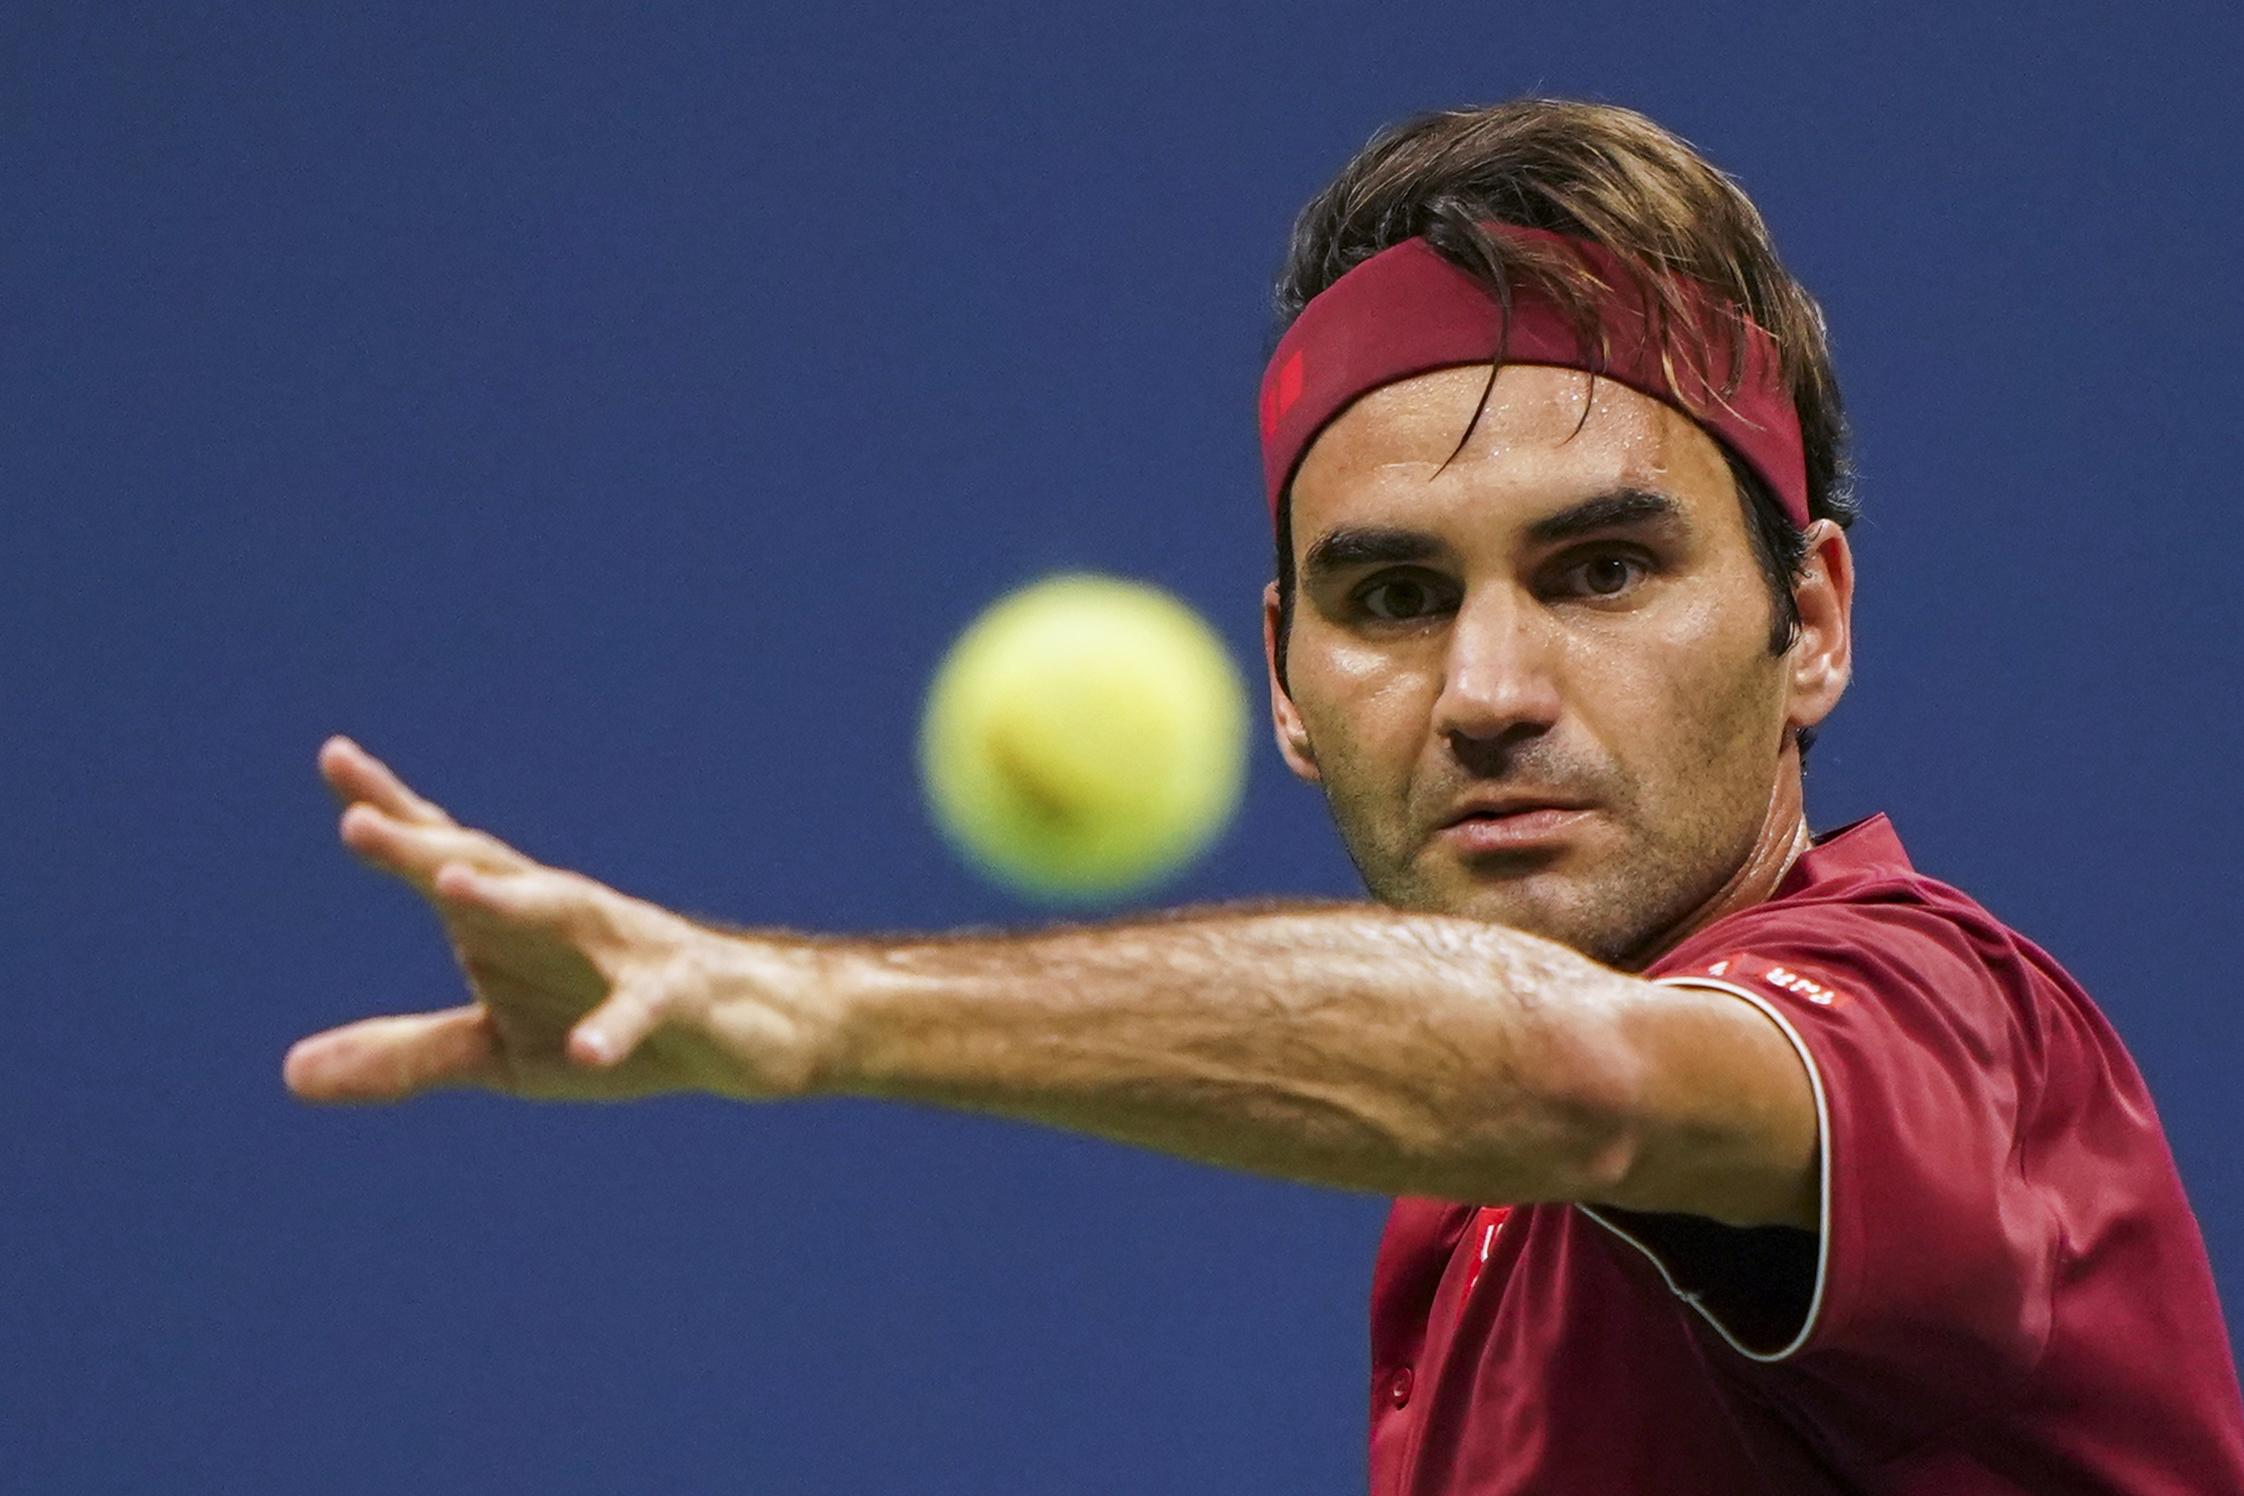 Europa-Duo Zverev/Federer (Bild) verliert gegen US-Team